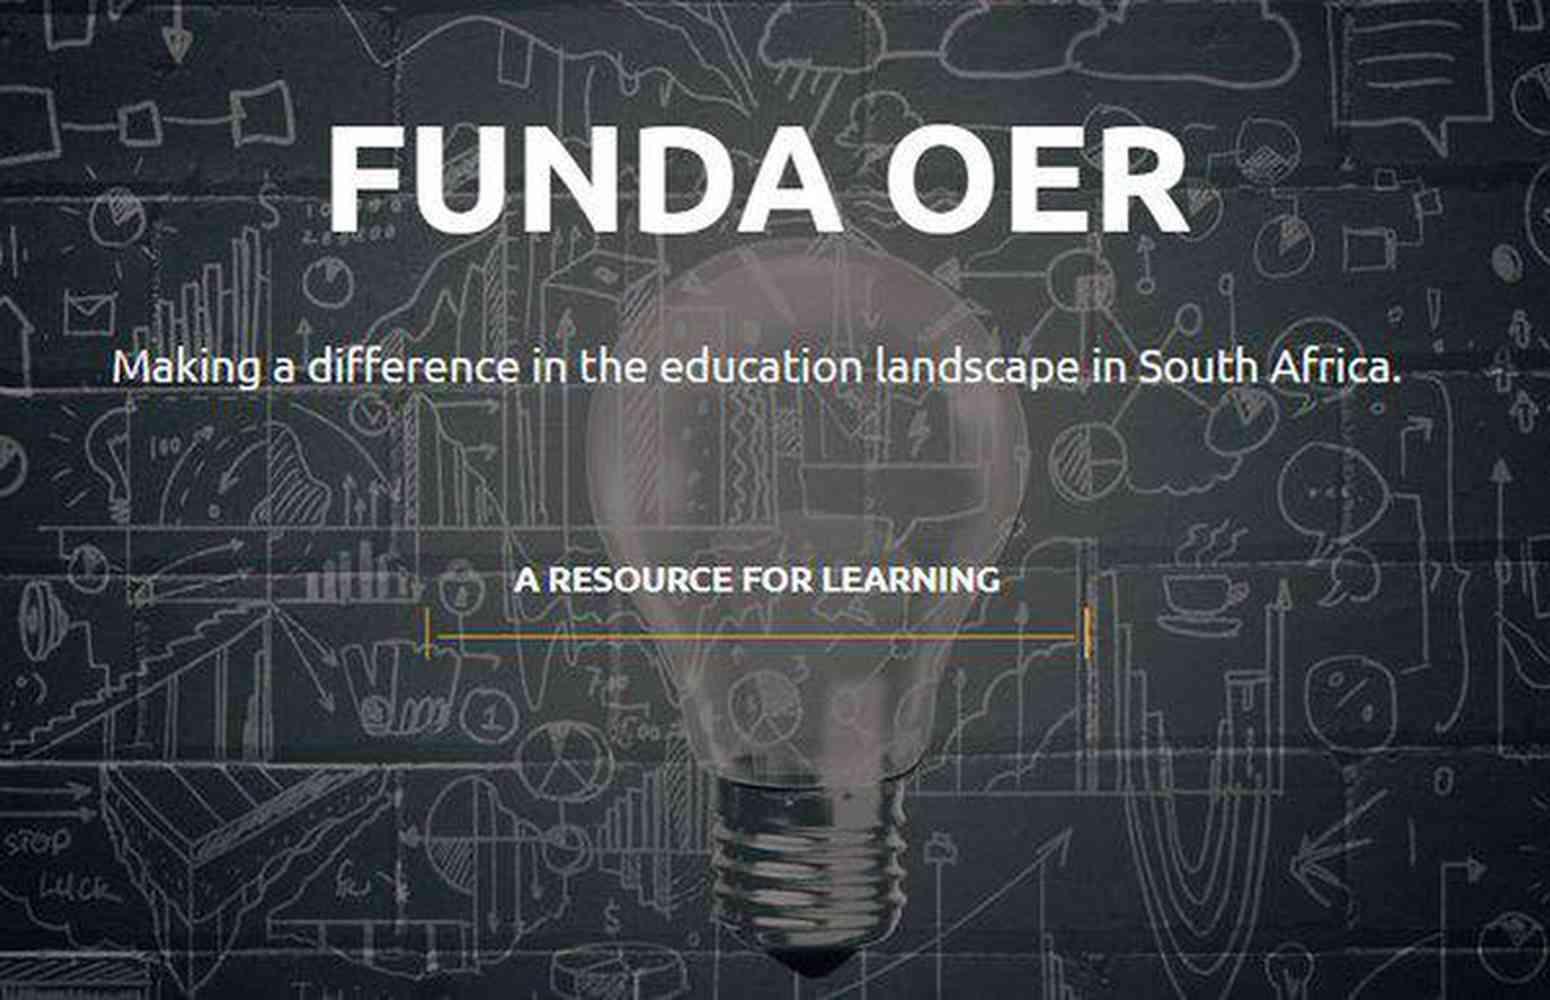 FUNDA Open Educational Resource